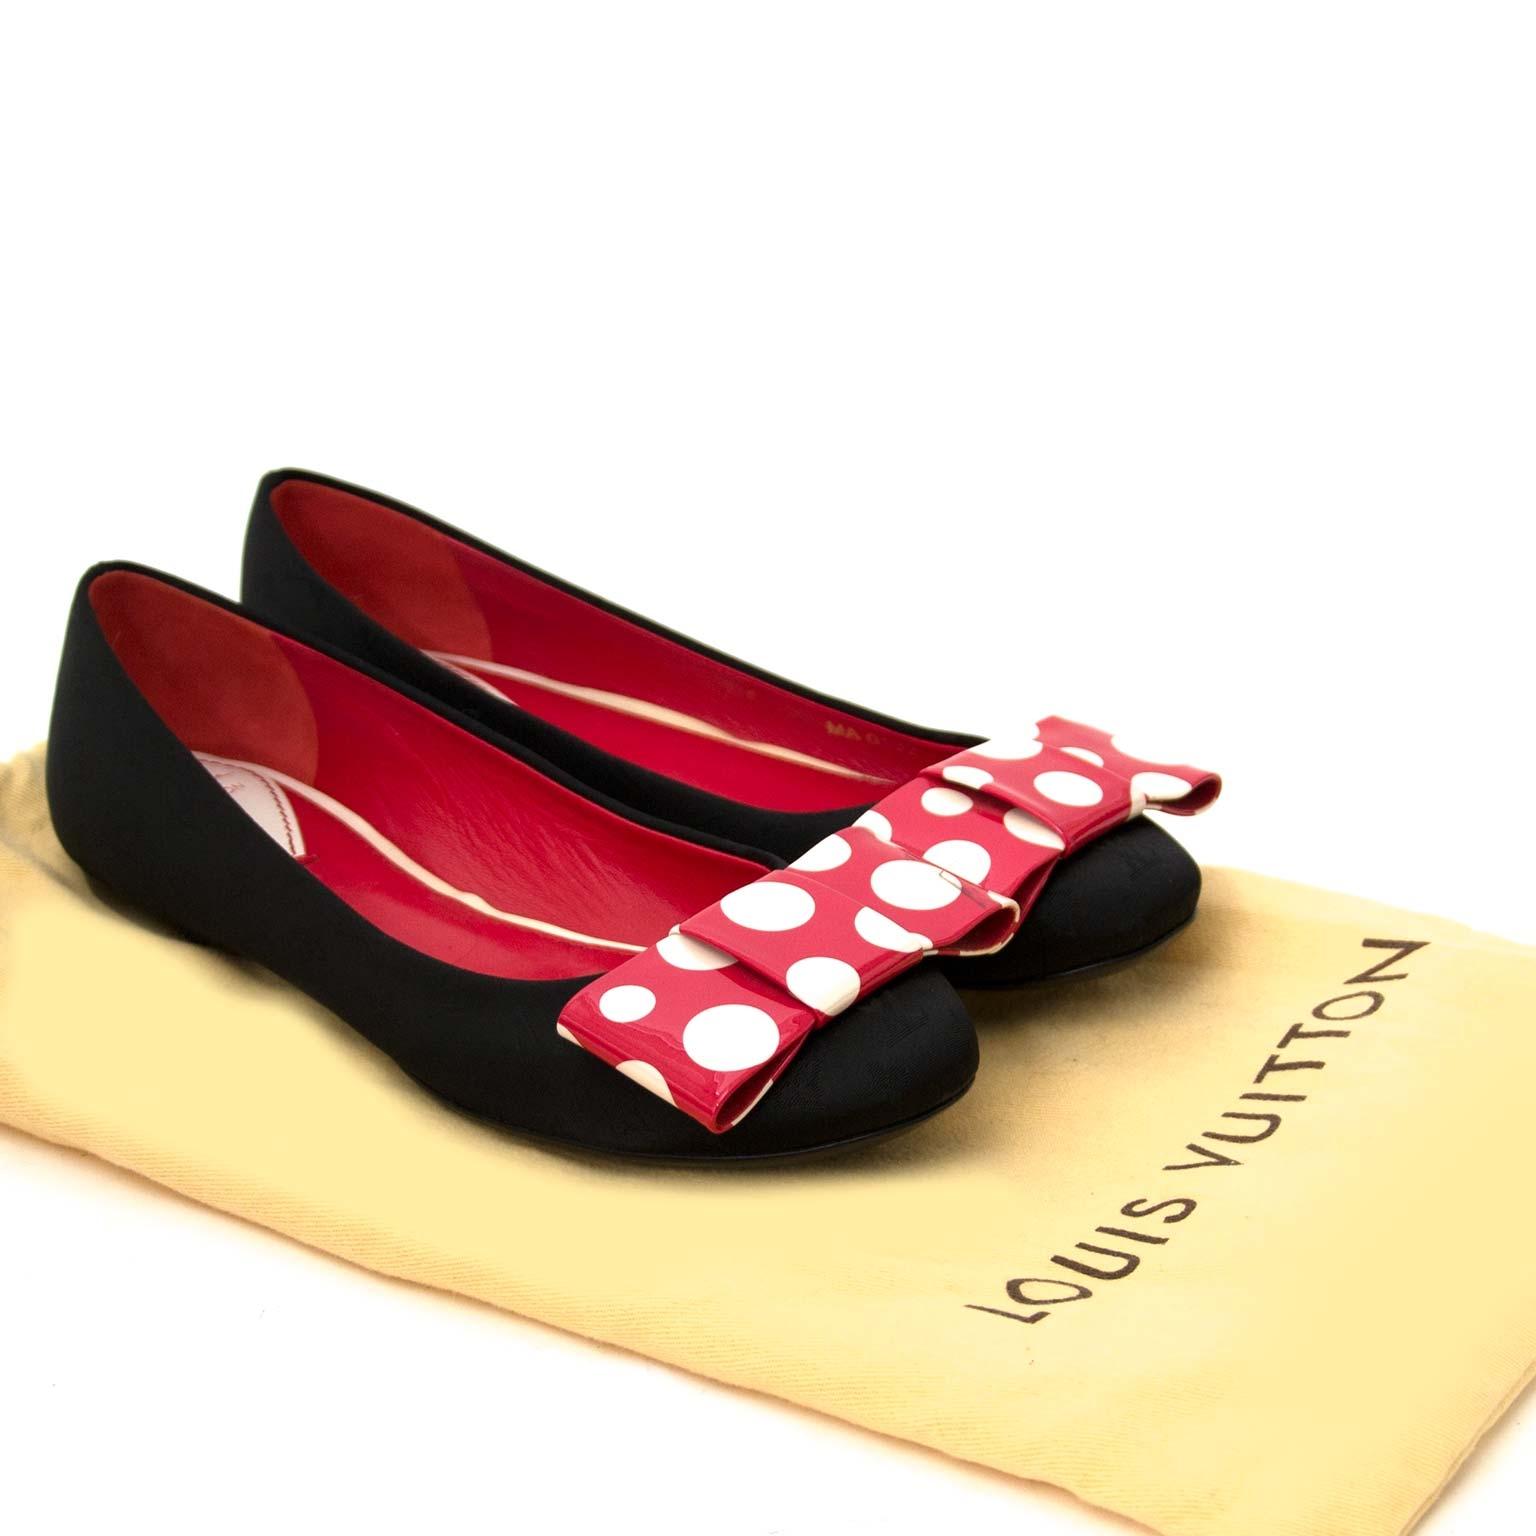 Koop authentieke louis vuitton ballerinas bij labellov vintage mode webshop